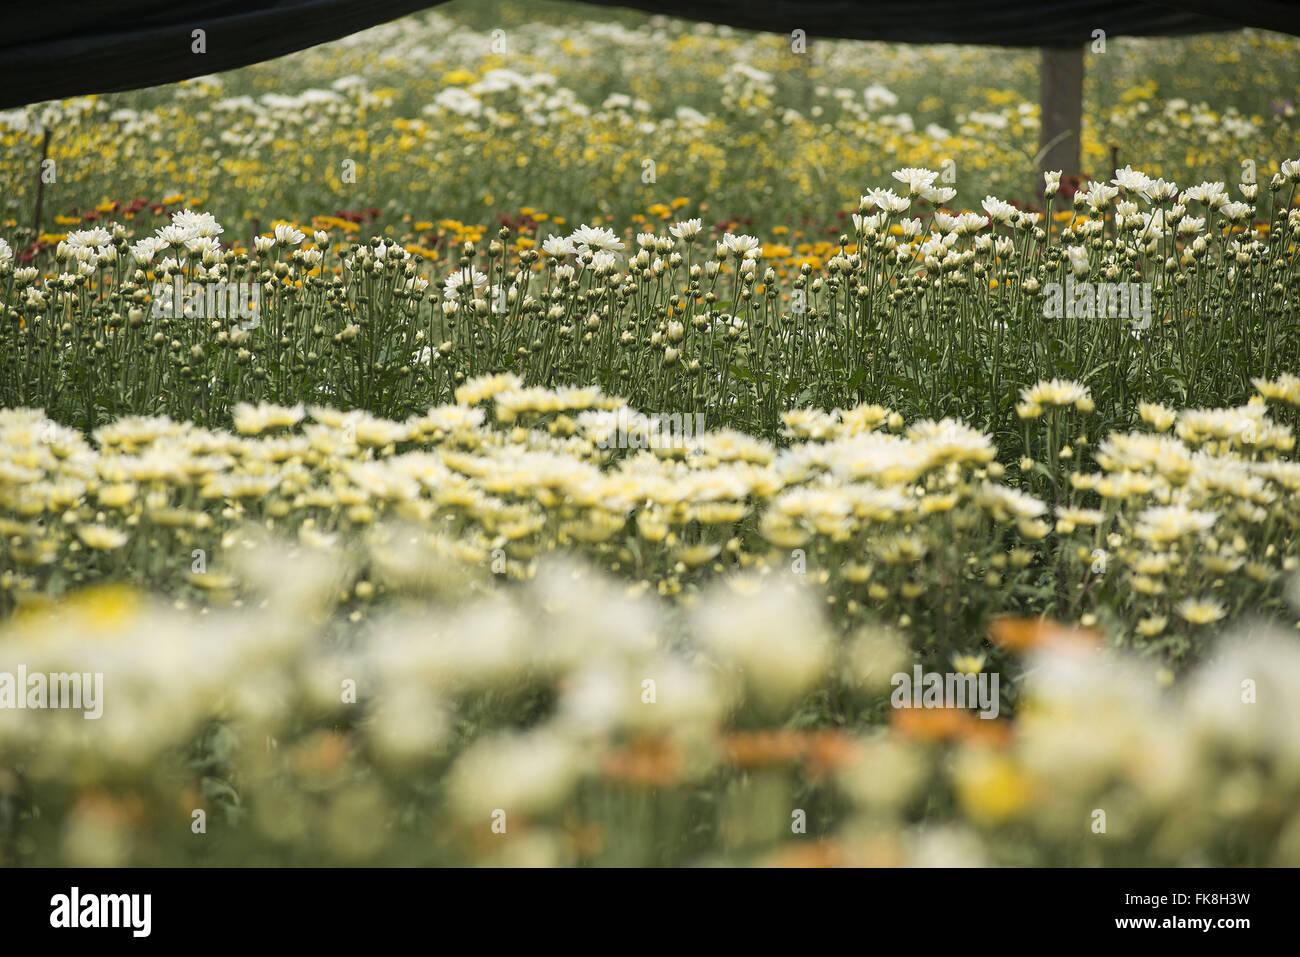 Planting chrysanthemums in the greenhouse Gale neighborhood - Stock Image